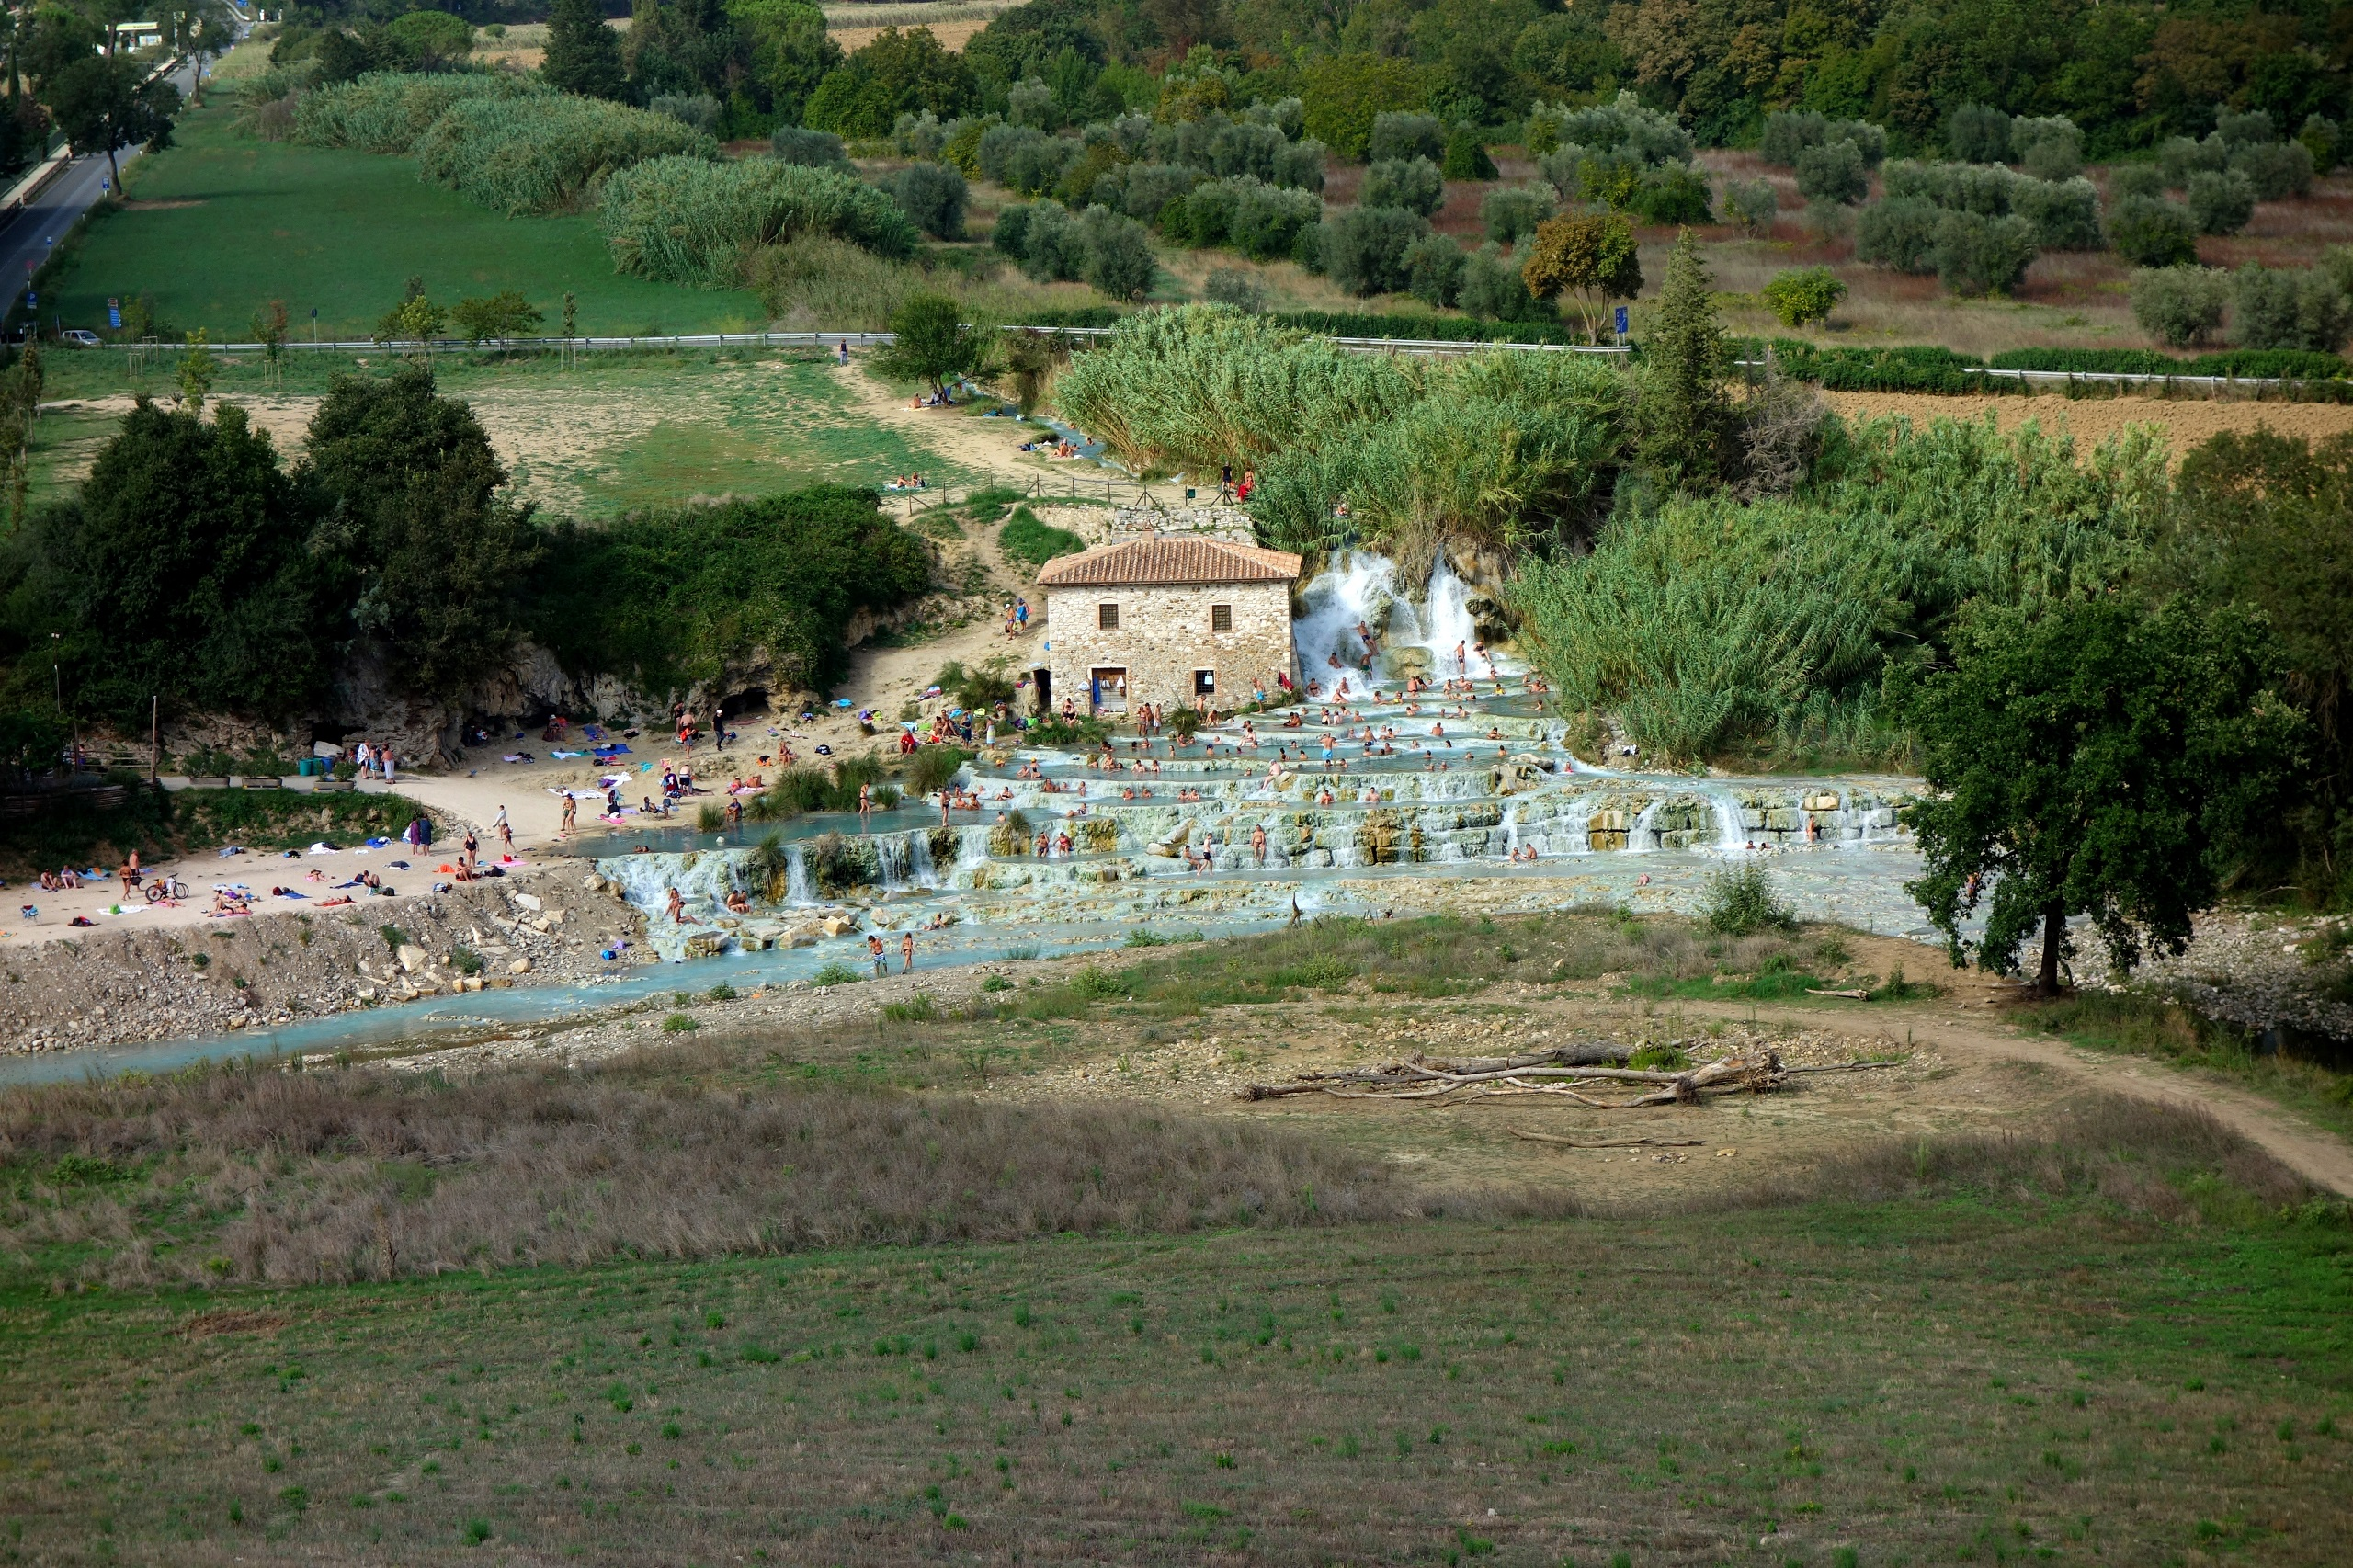 Cascate del Mulino - widok z góry